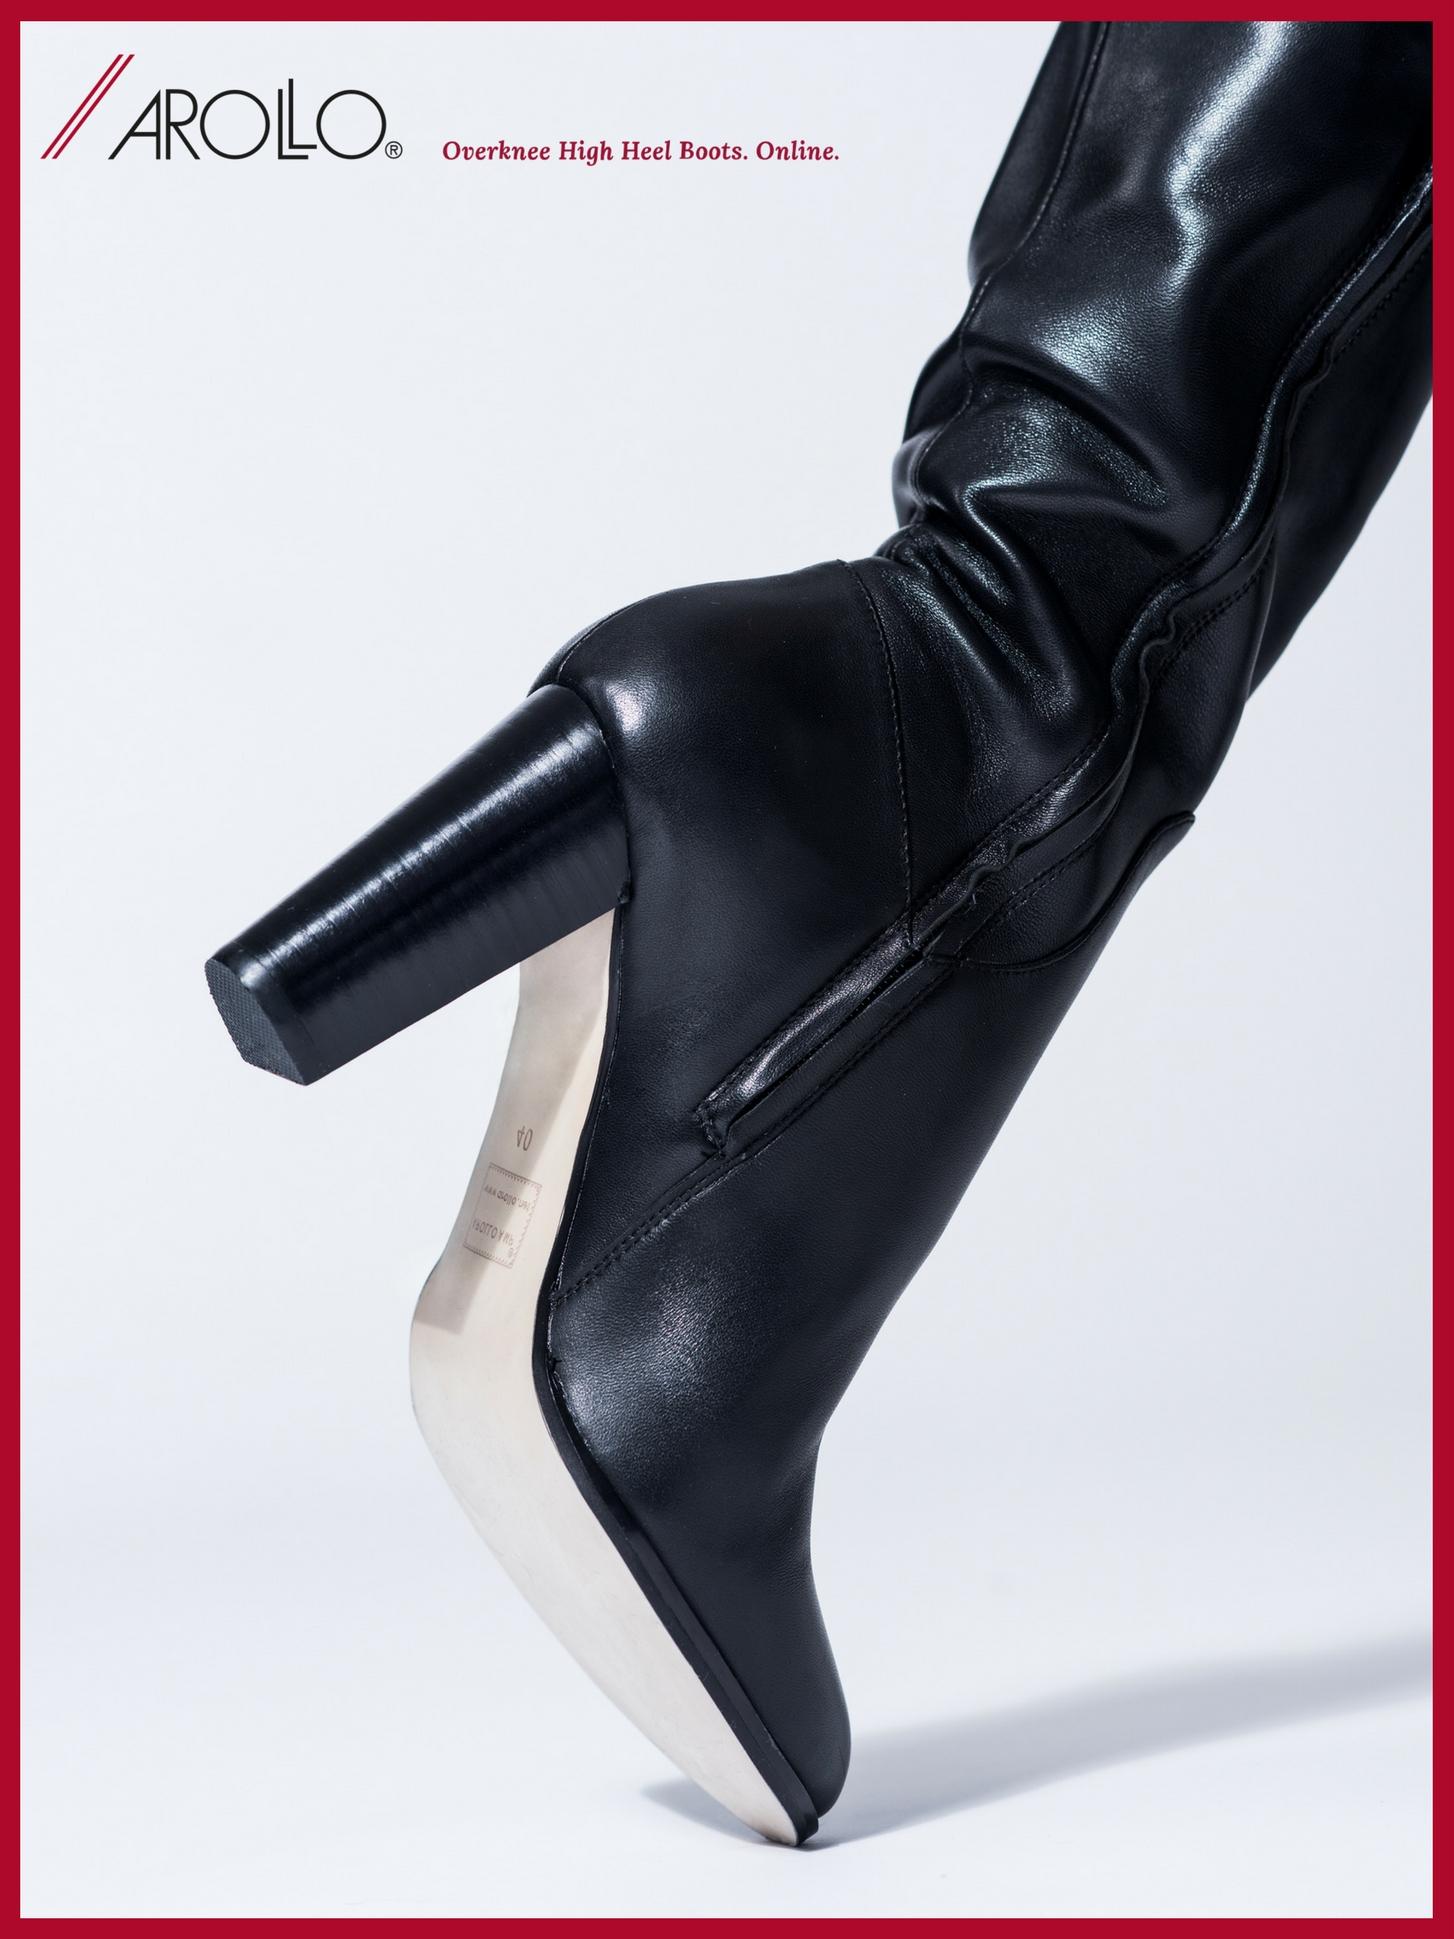 AROLLO Low Heel 9cm